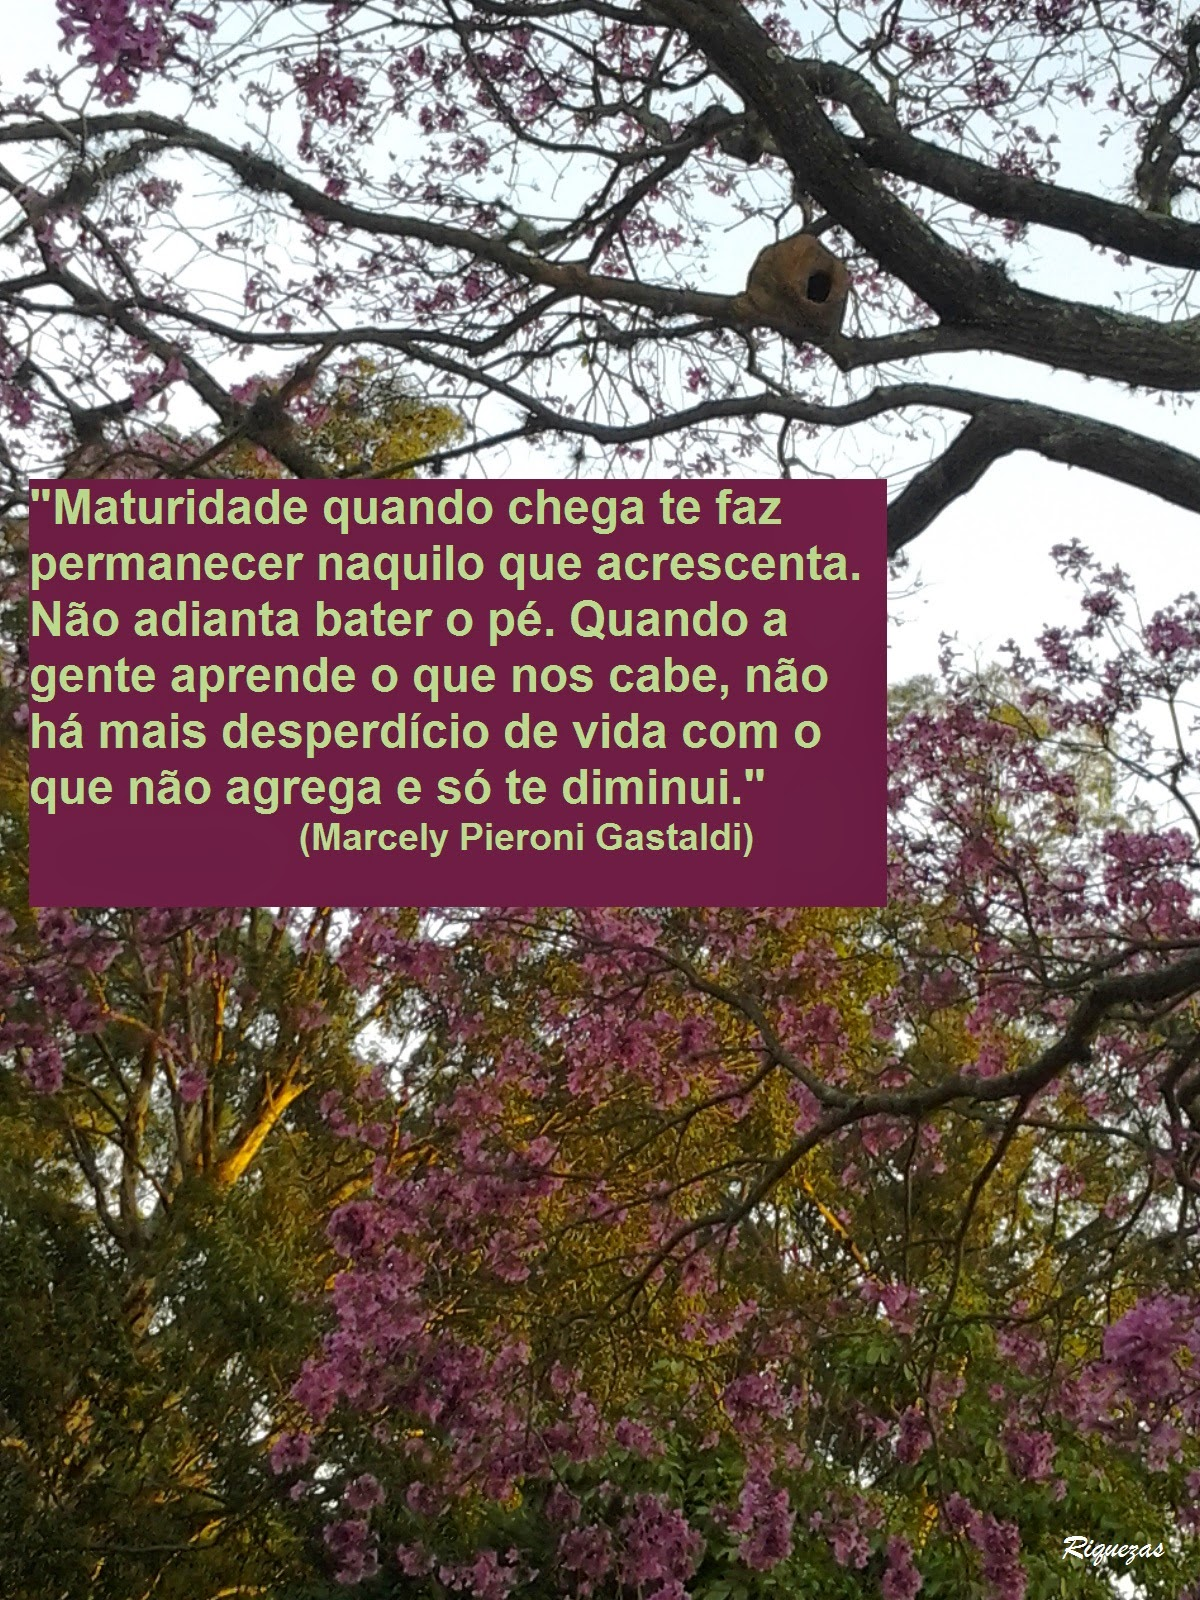 Foto tirada no Parque do Ibirapuera